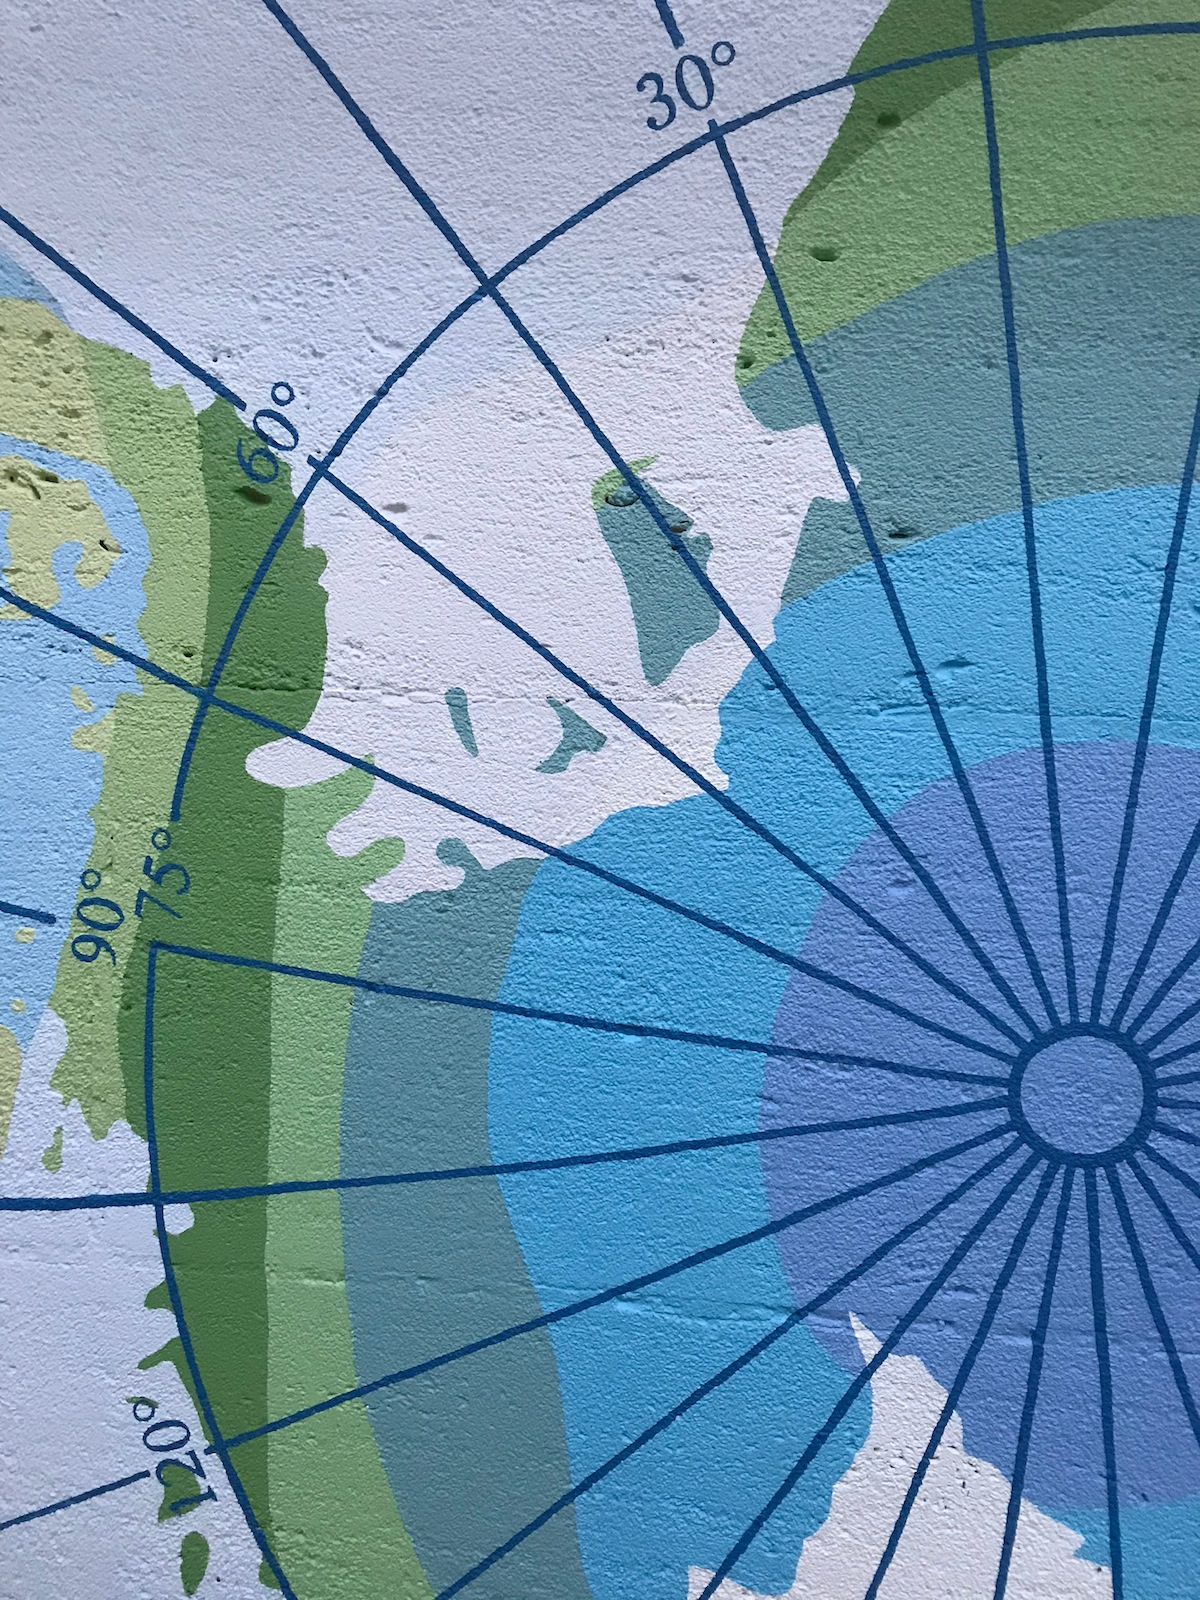 Buckminster_fuller_mural_dymaxion_map-02